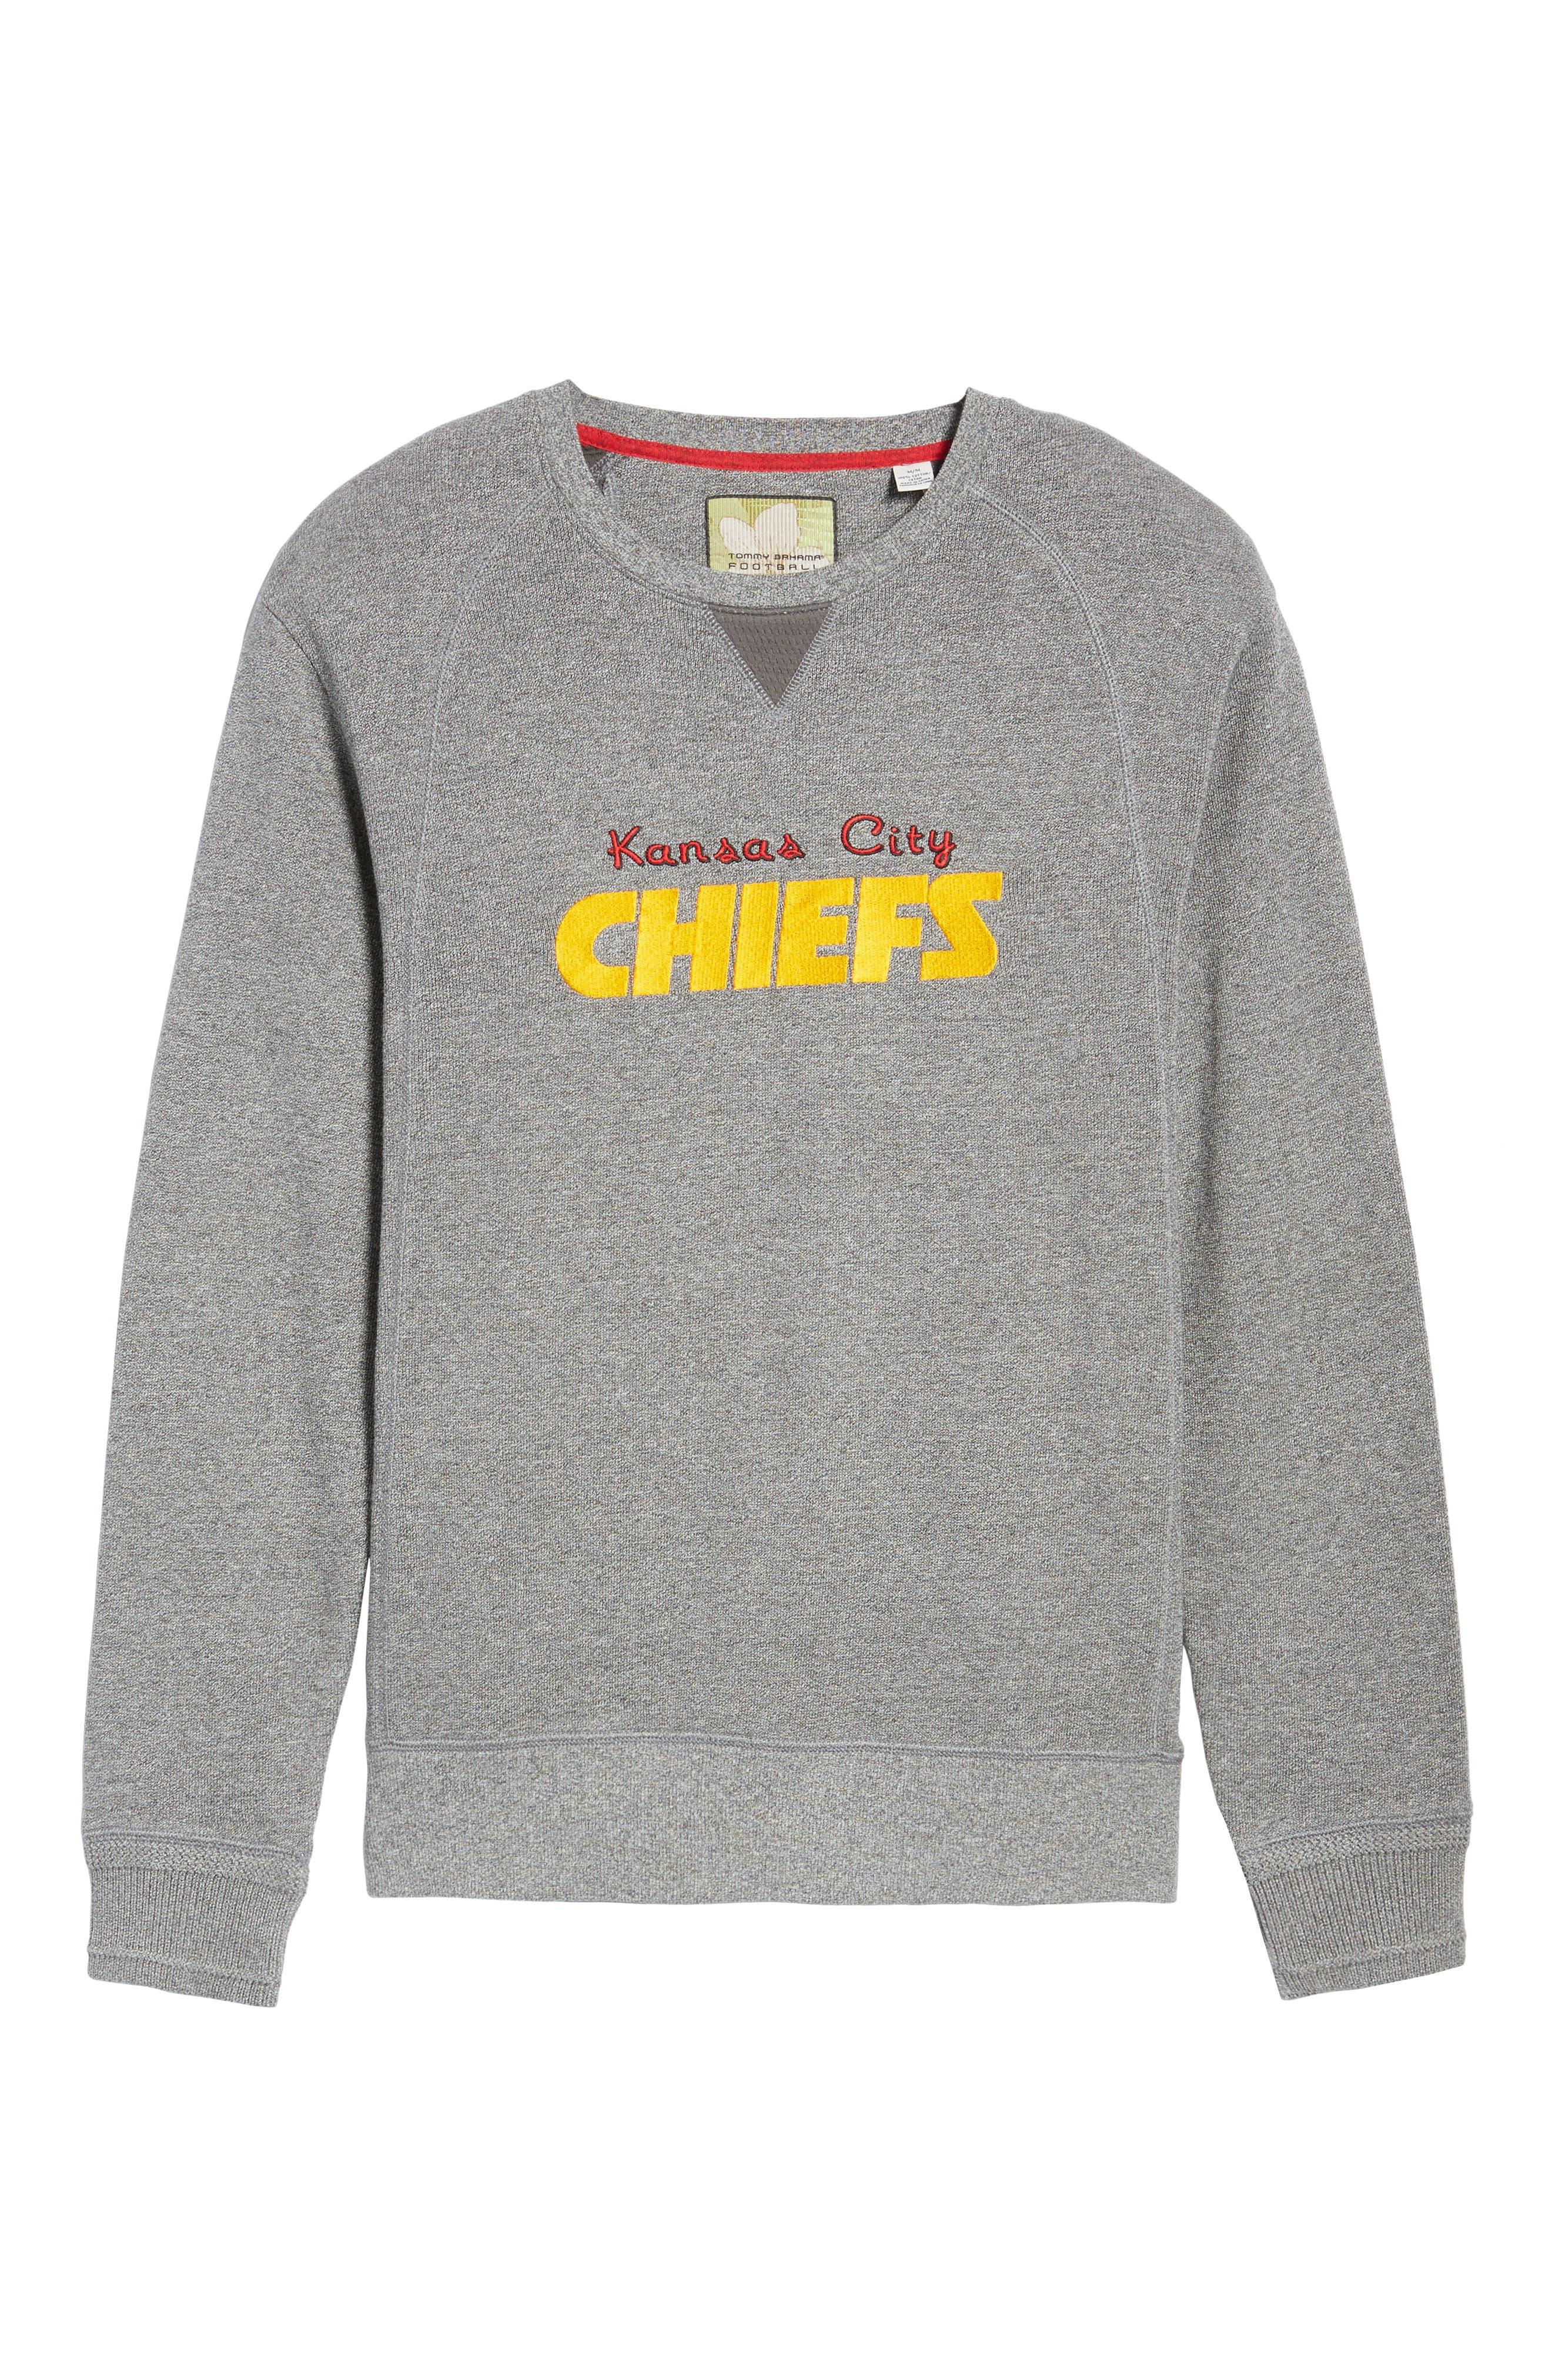 NFL Stitch of Liberty Embroidered Crewneck Sweatshirt,                             Alternate thumbnail 162, color,